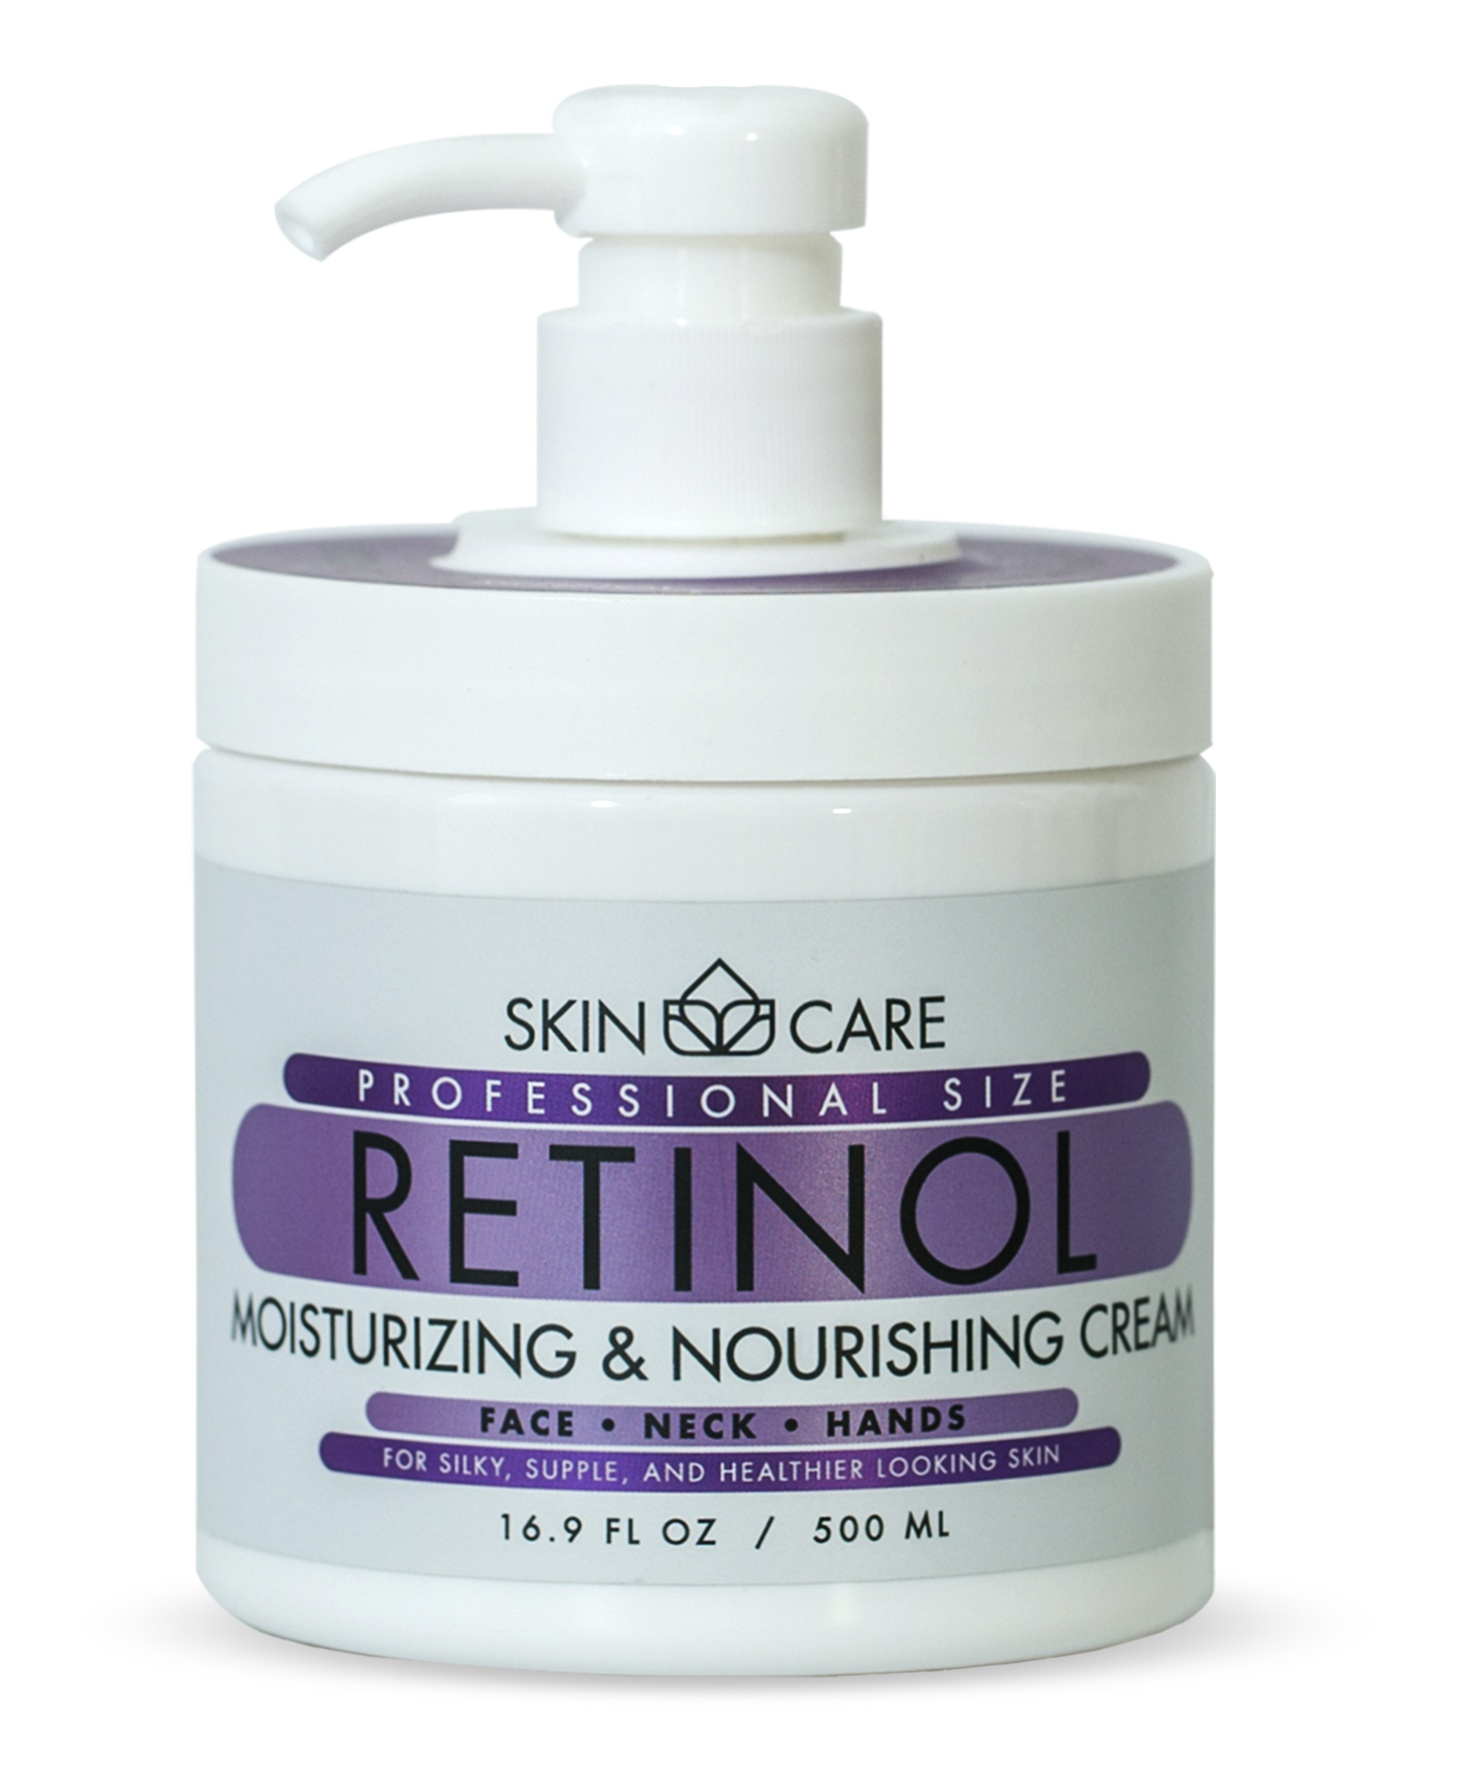 Dead Sea Collection Skin Care Retinol Moisturizing & Nourishing Cream